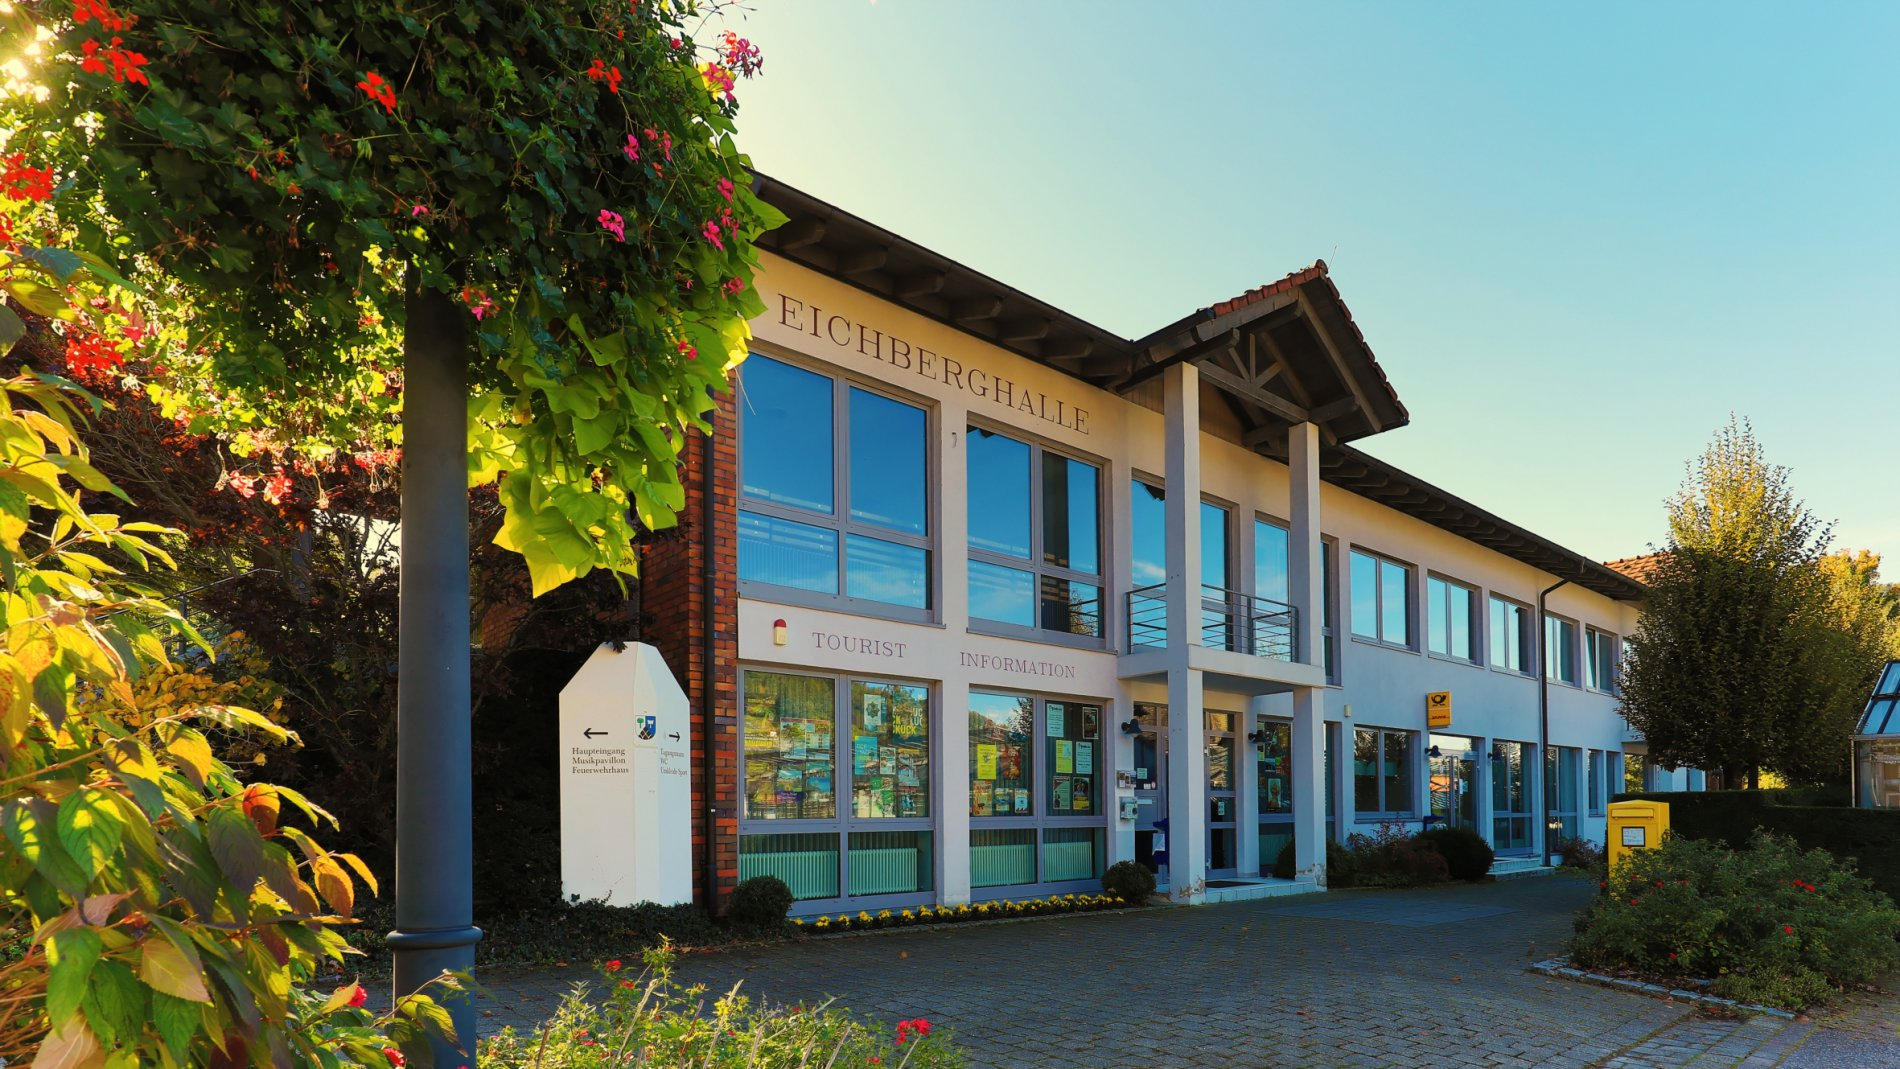 Eichberghalle Glottertal